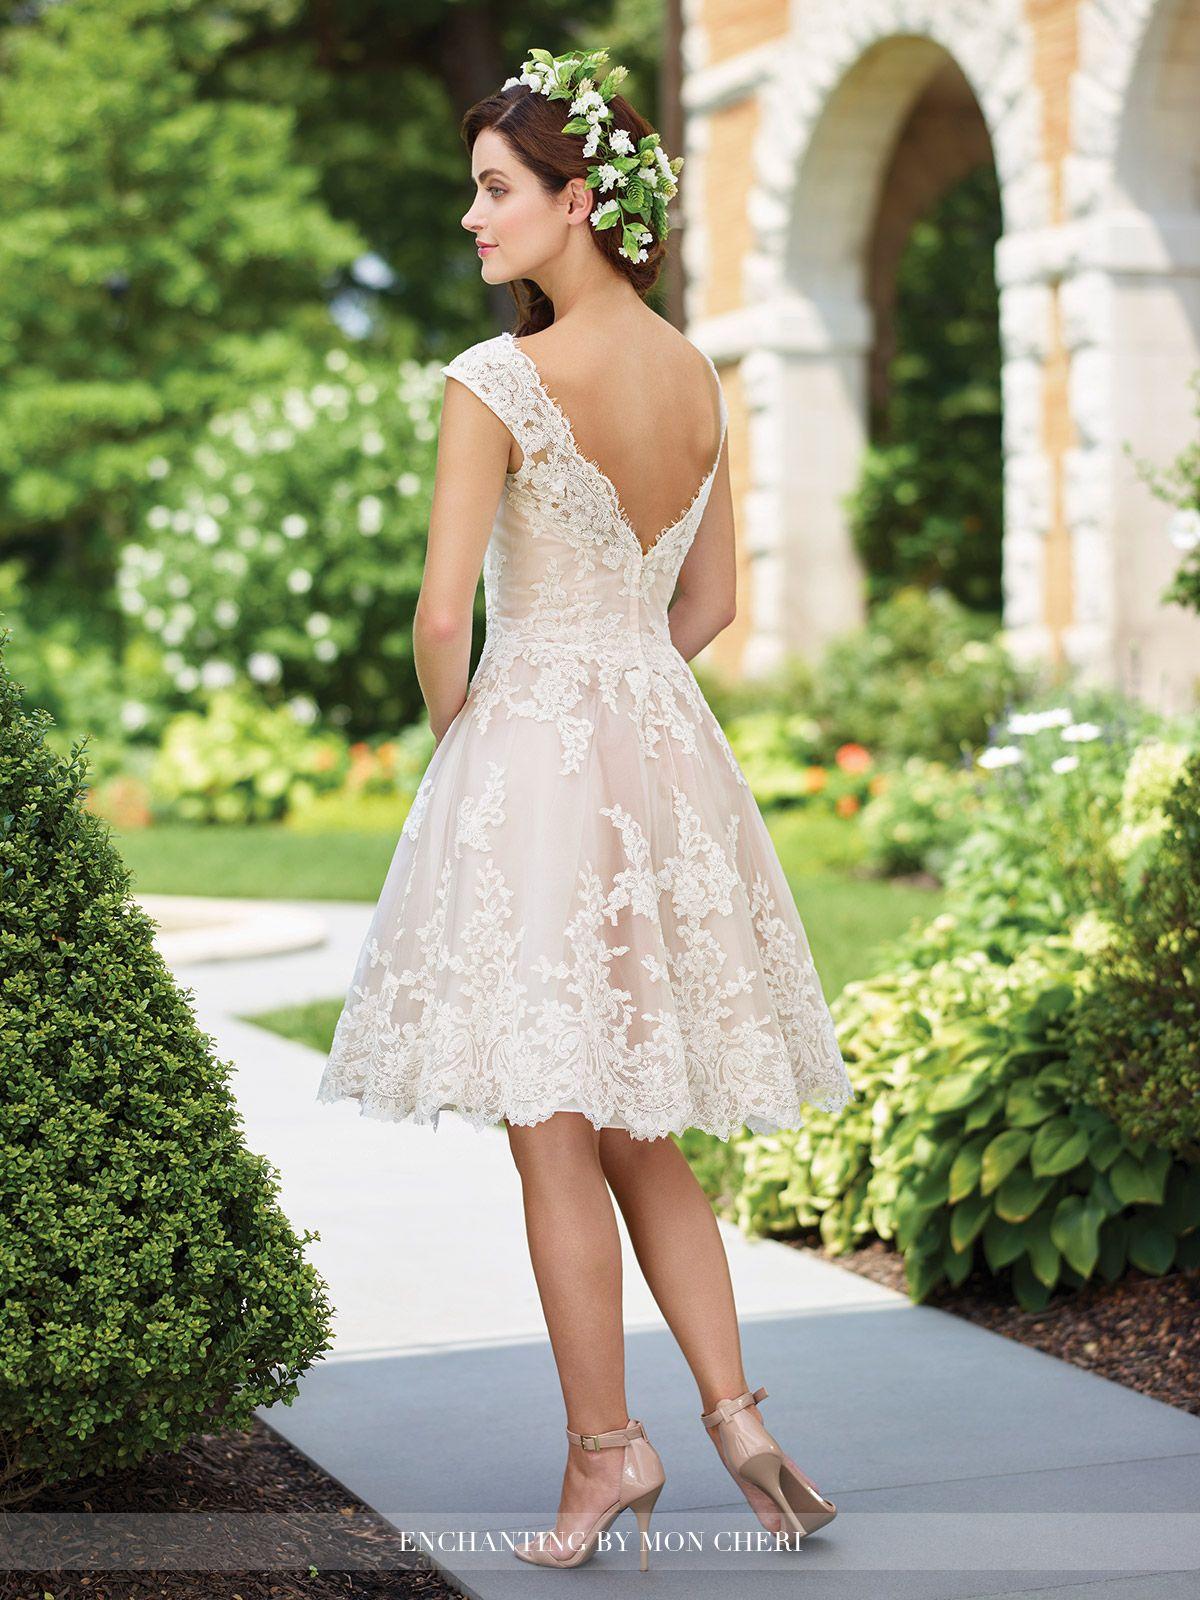 Wedding Dresses Enchanting By Mon Cheri Knee Length Wedding Dress Short Bridal Dress Wedding Dresses [ 1600 x 1200 Pixel ]